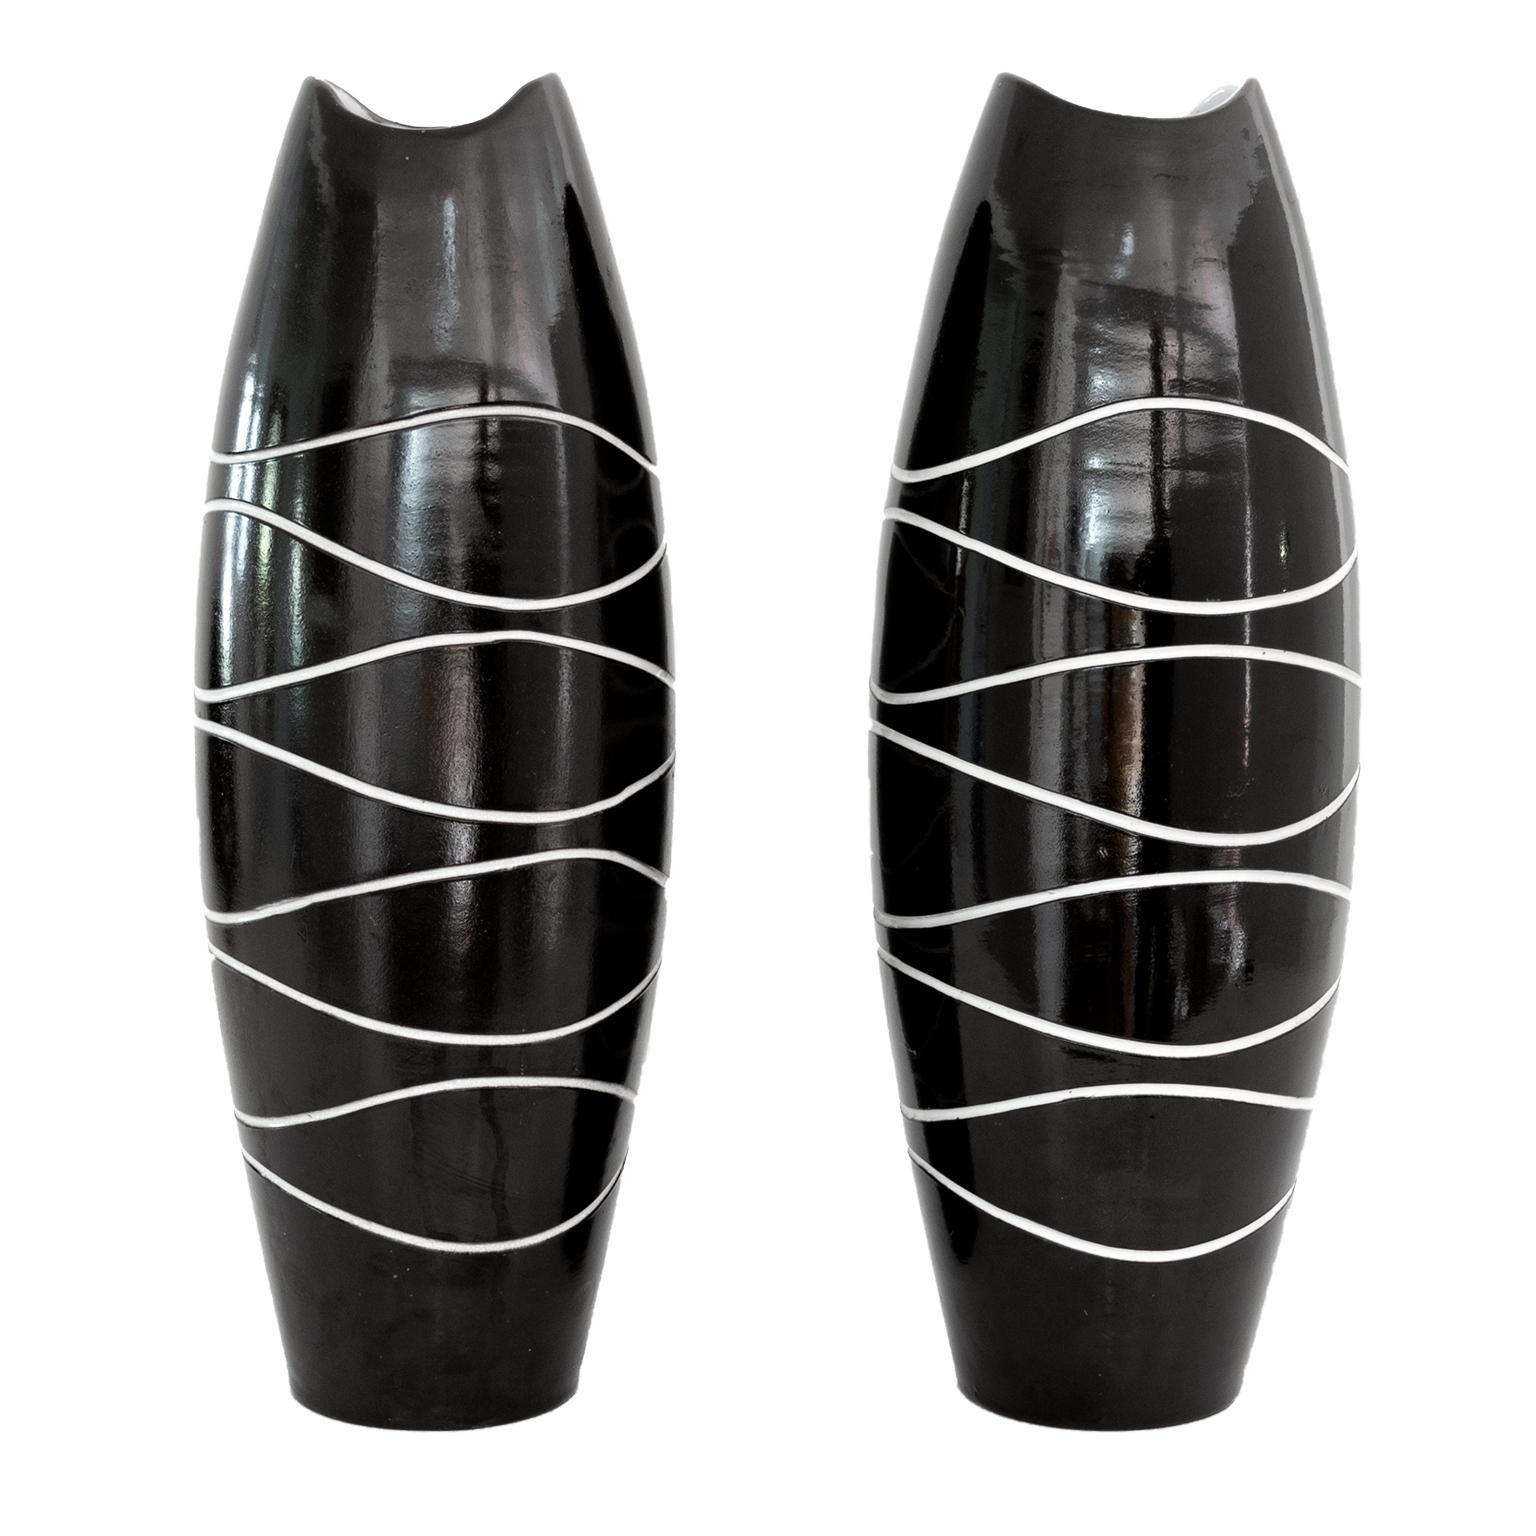 Scandinavian Modern Pair of Atoll Vases by Hjördis Oldfors, Upsala Ekeby Sweden